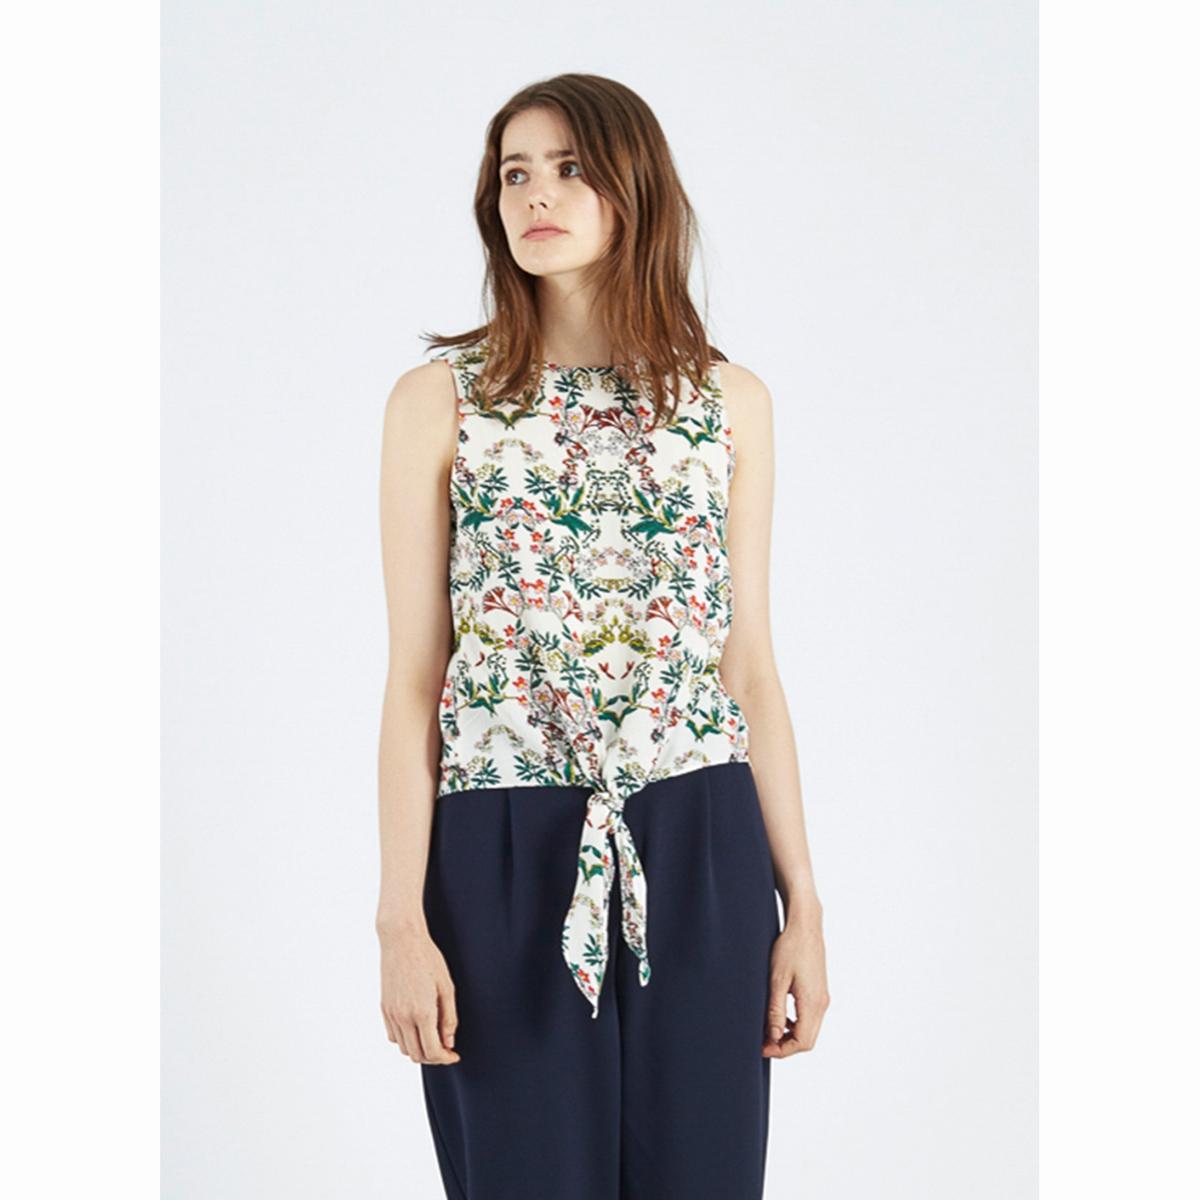 цена Блузка без рукавов с цветочным рисунком Juniper онлайн в 2017 году